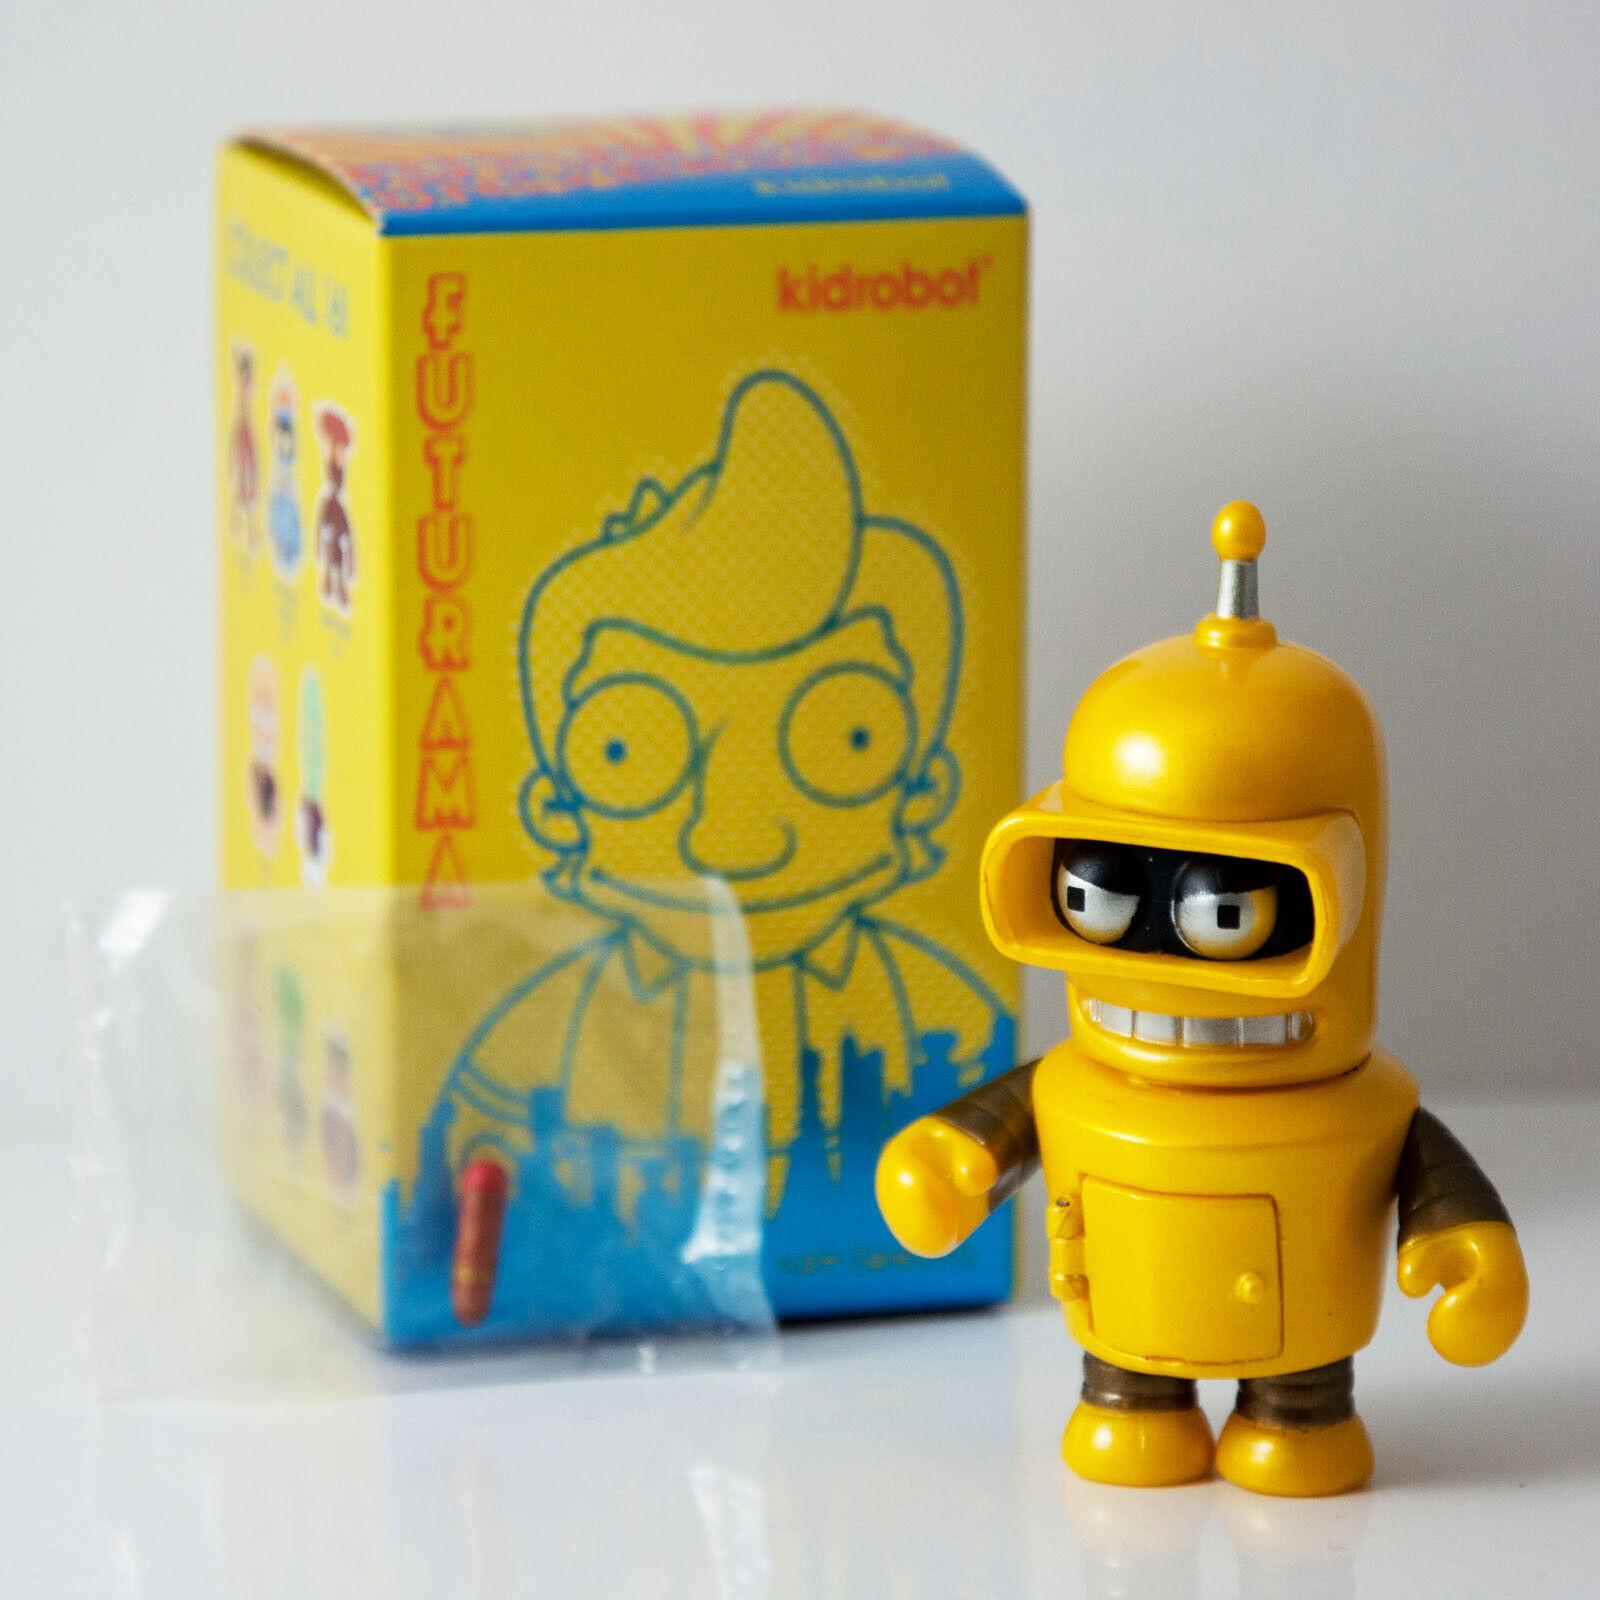 Gold Bender - Futurama Universe X Vinyl Mini Series by Kidrobot Brand New